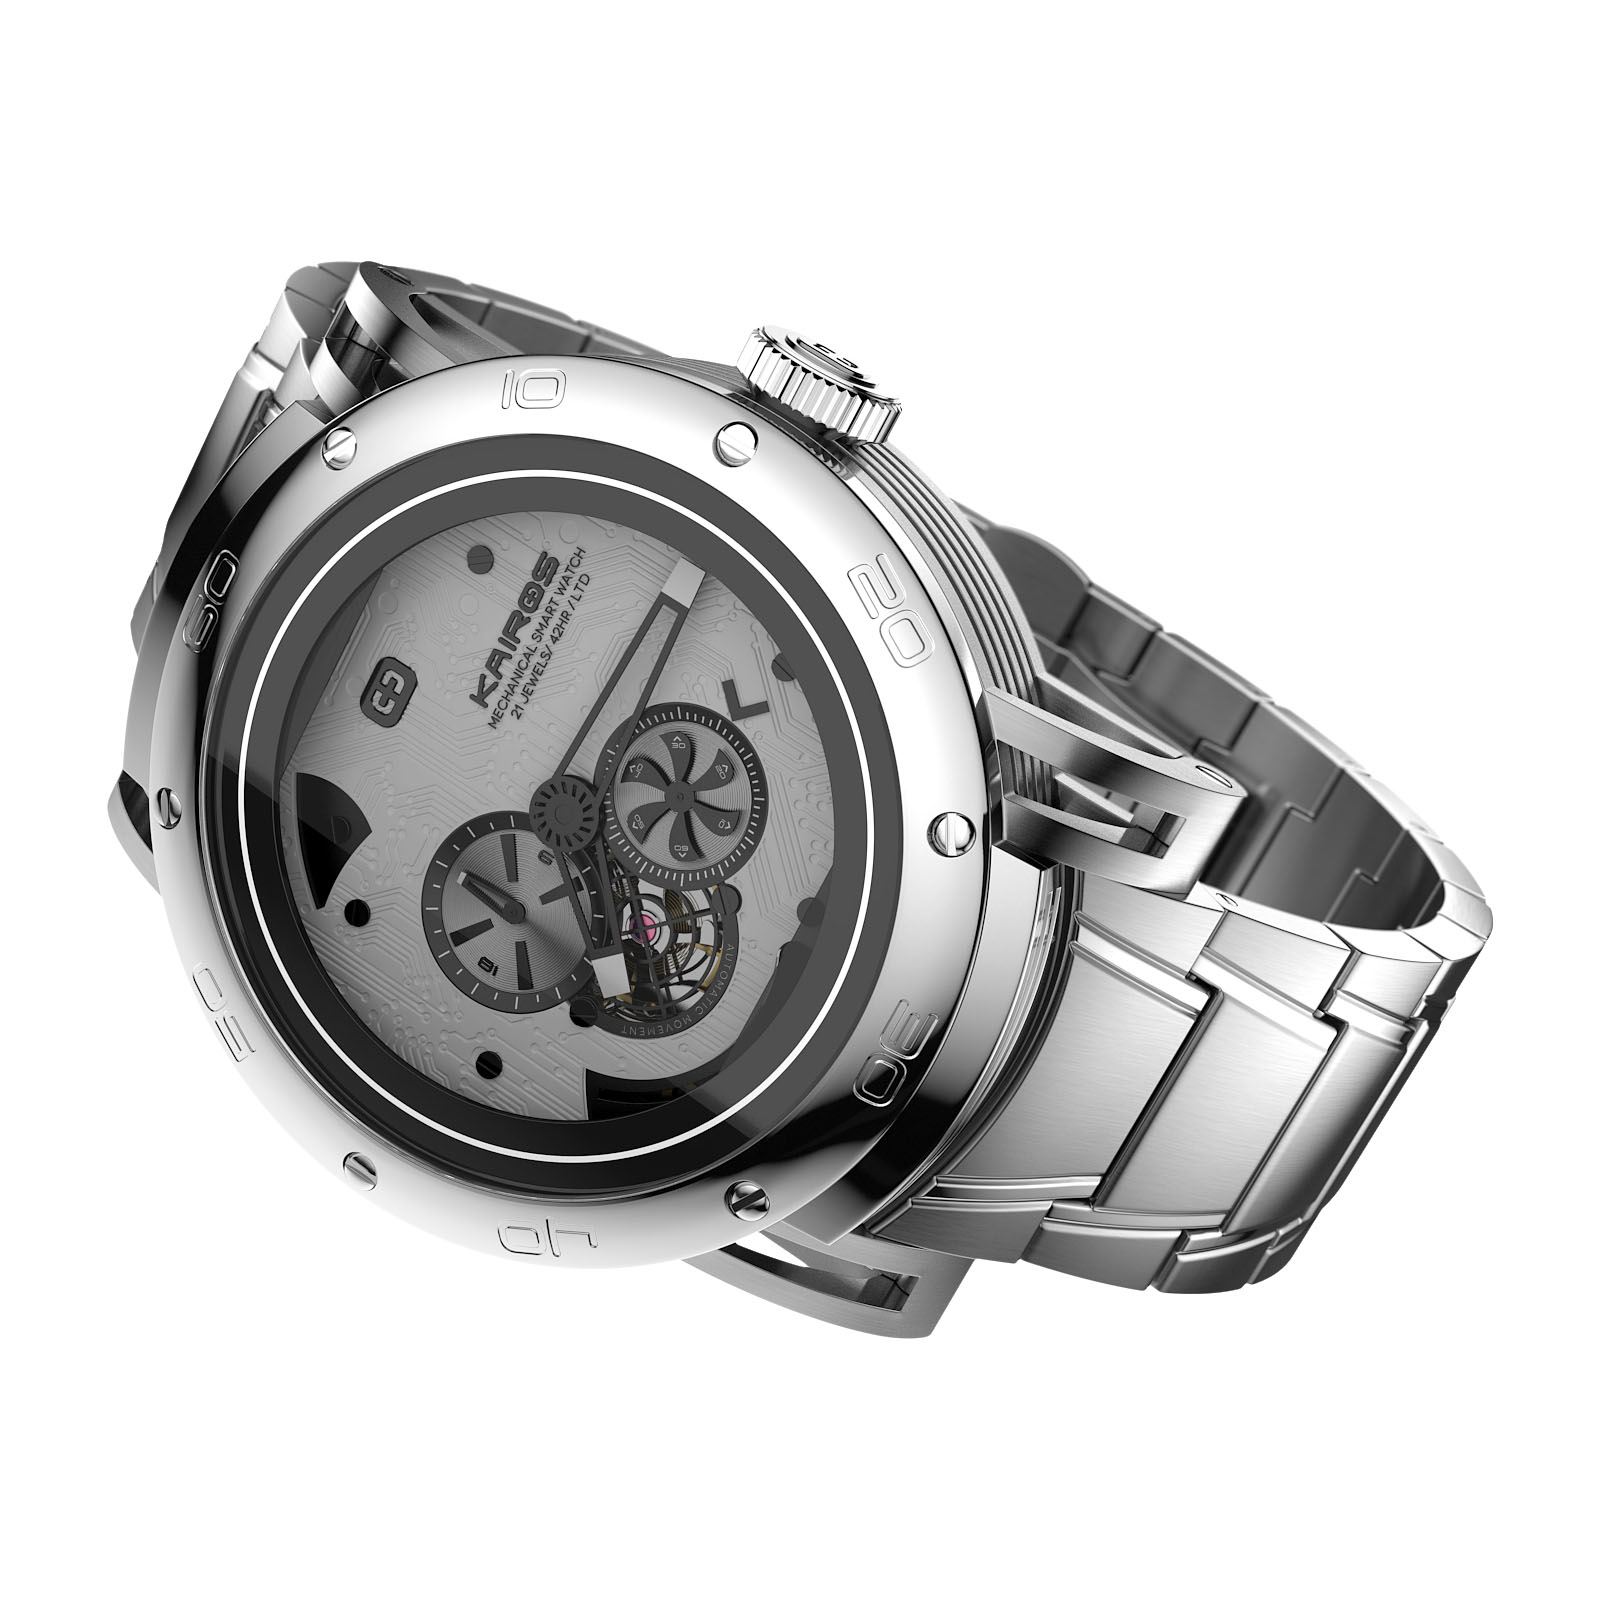 Kairos' MSW hybrid smartwatch CGI with metal band